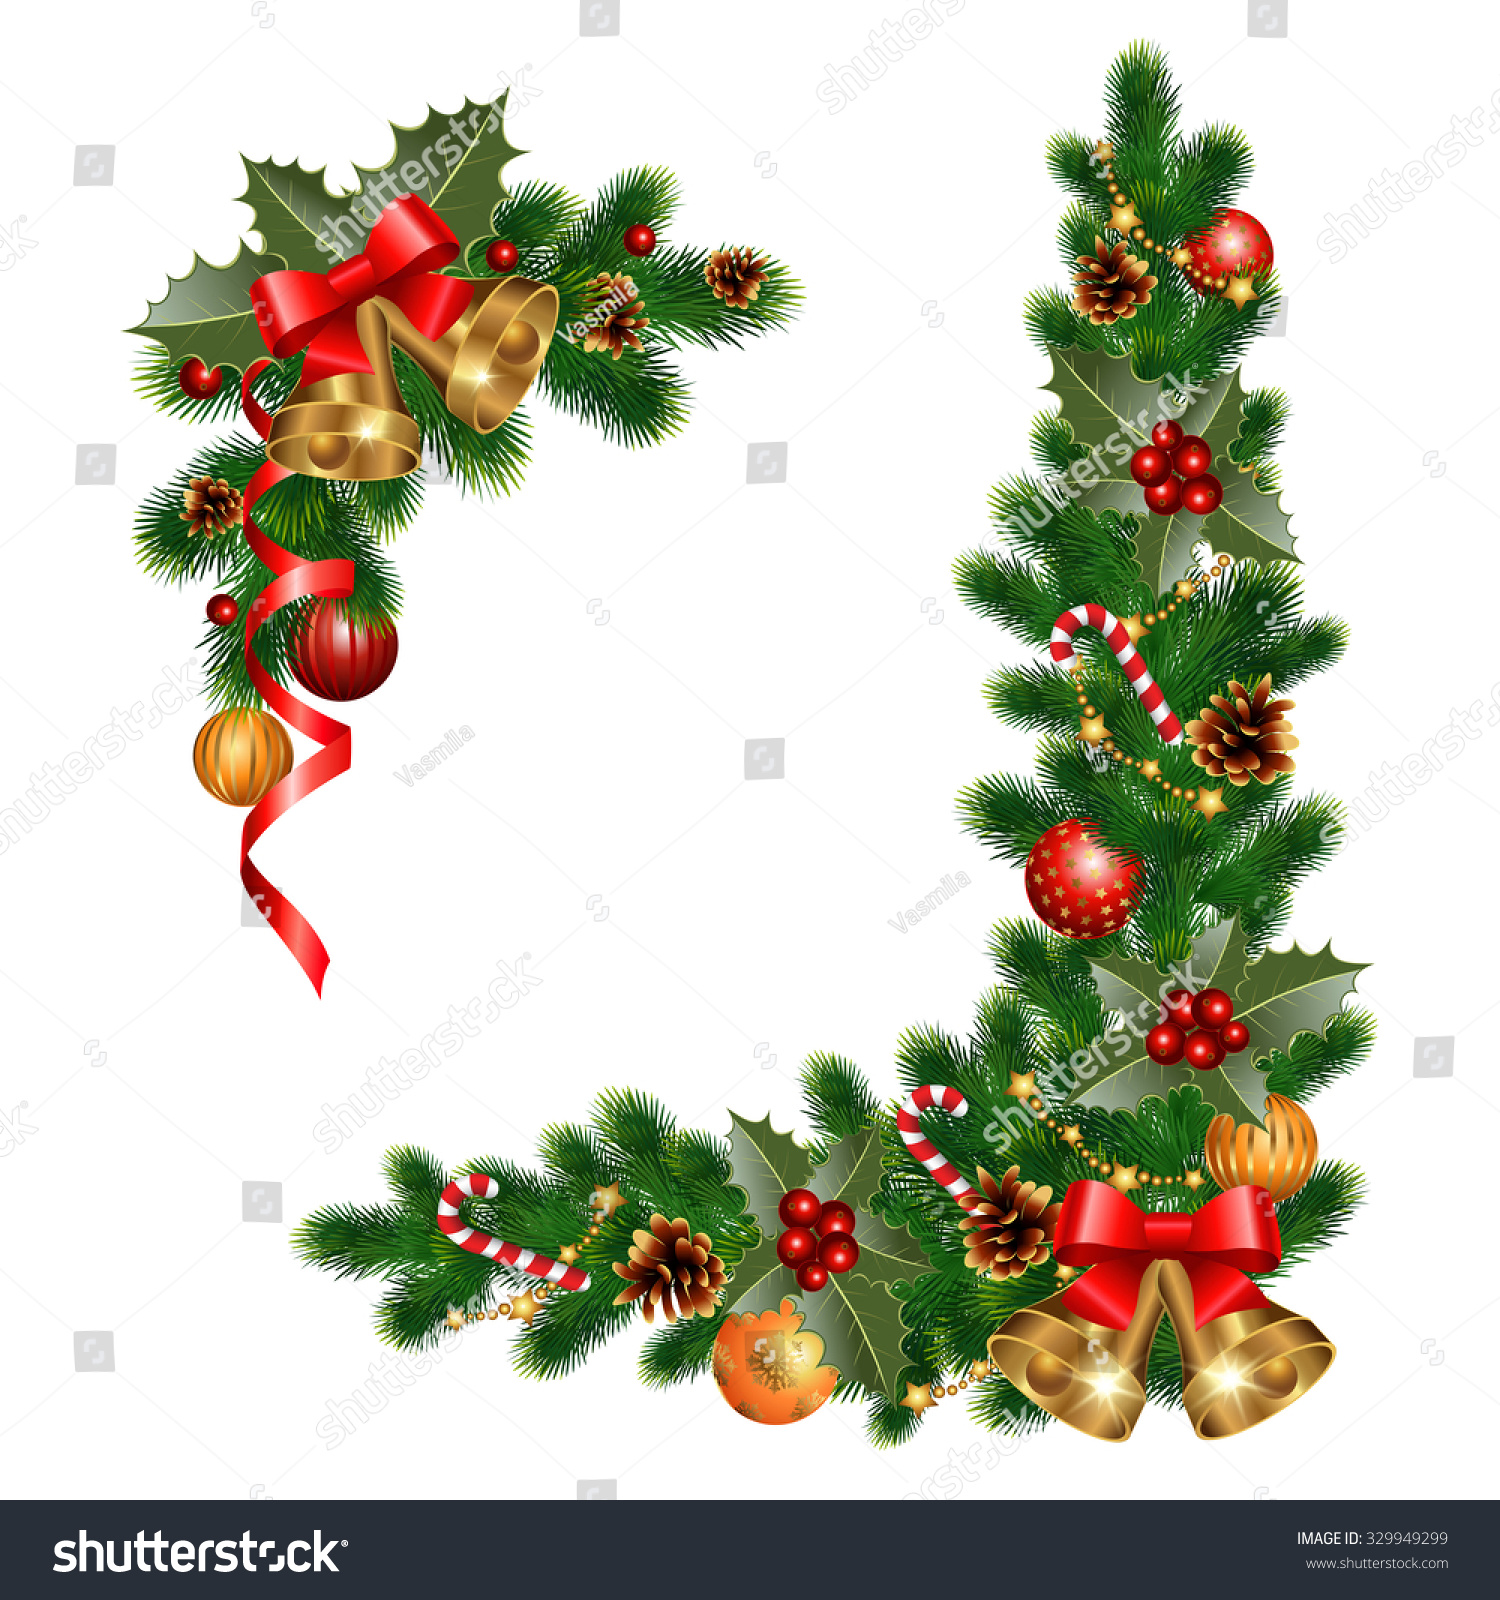 Christmas Decorations Fir Tree Decorative Elements Stock